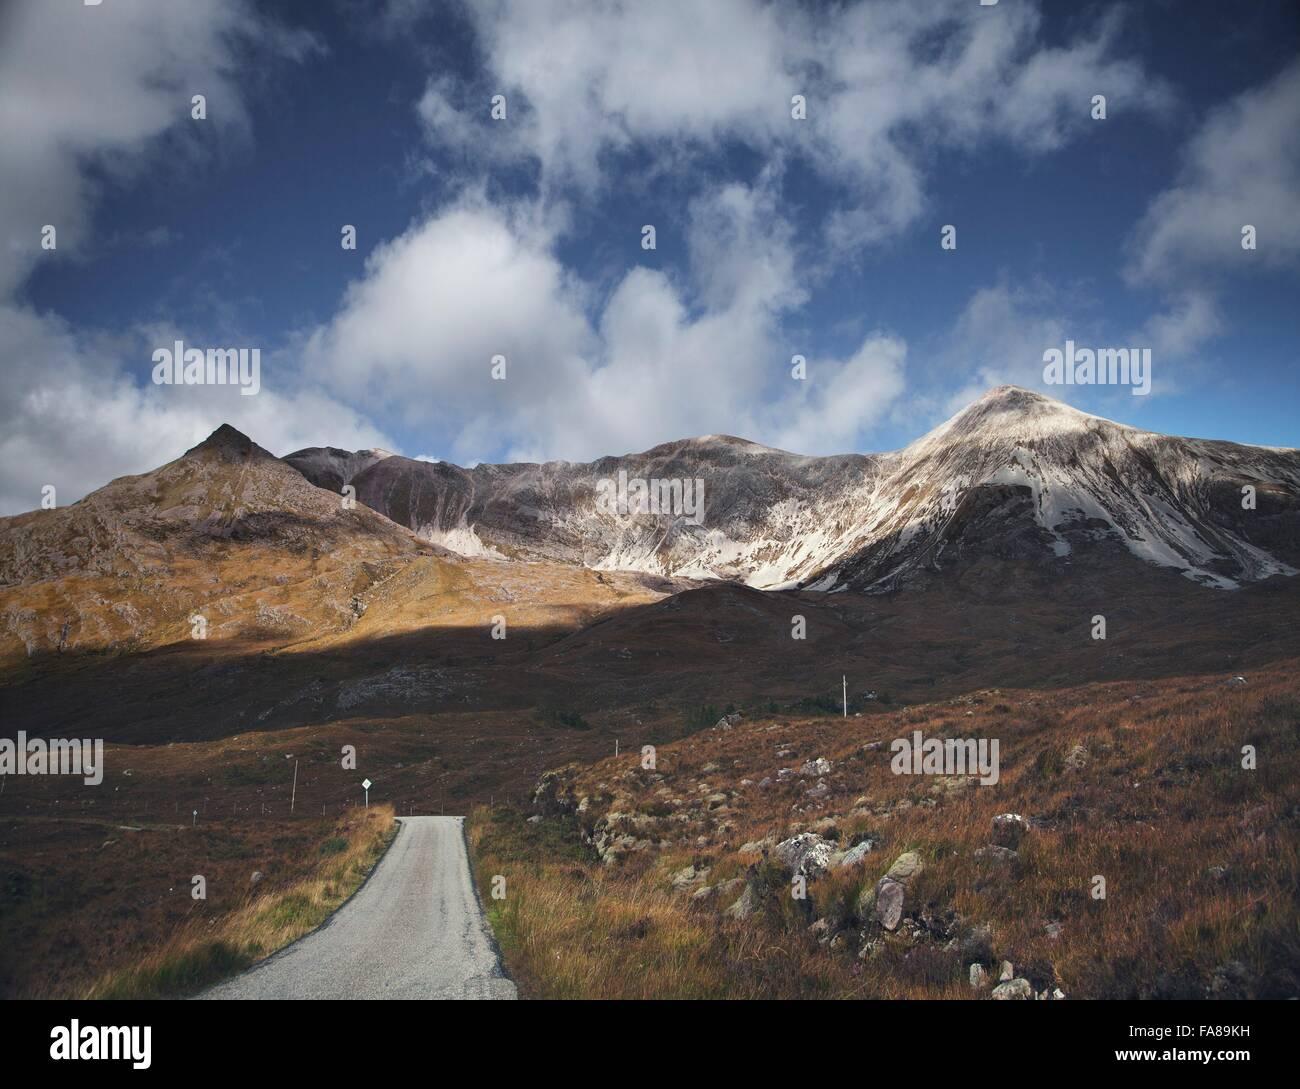 Solo vía carretera a través de la cordillera, Highland, Escocia Foto de stock